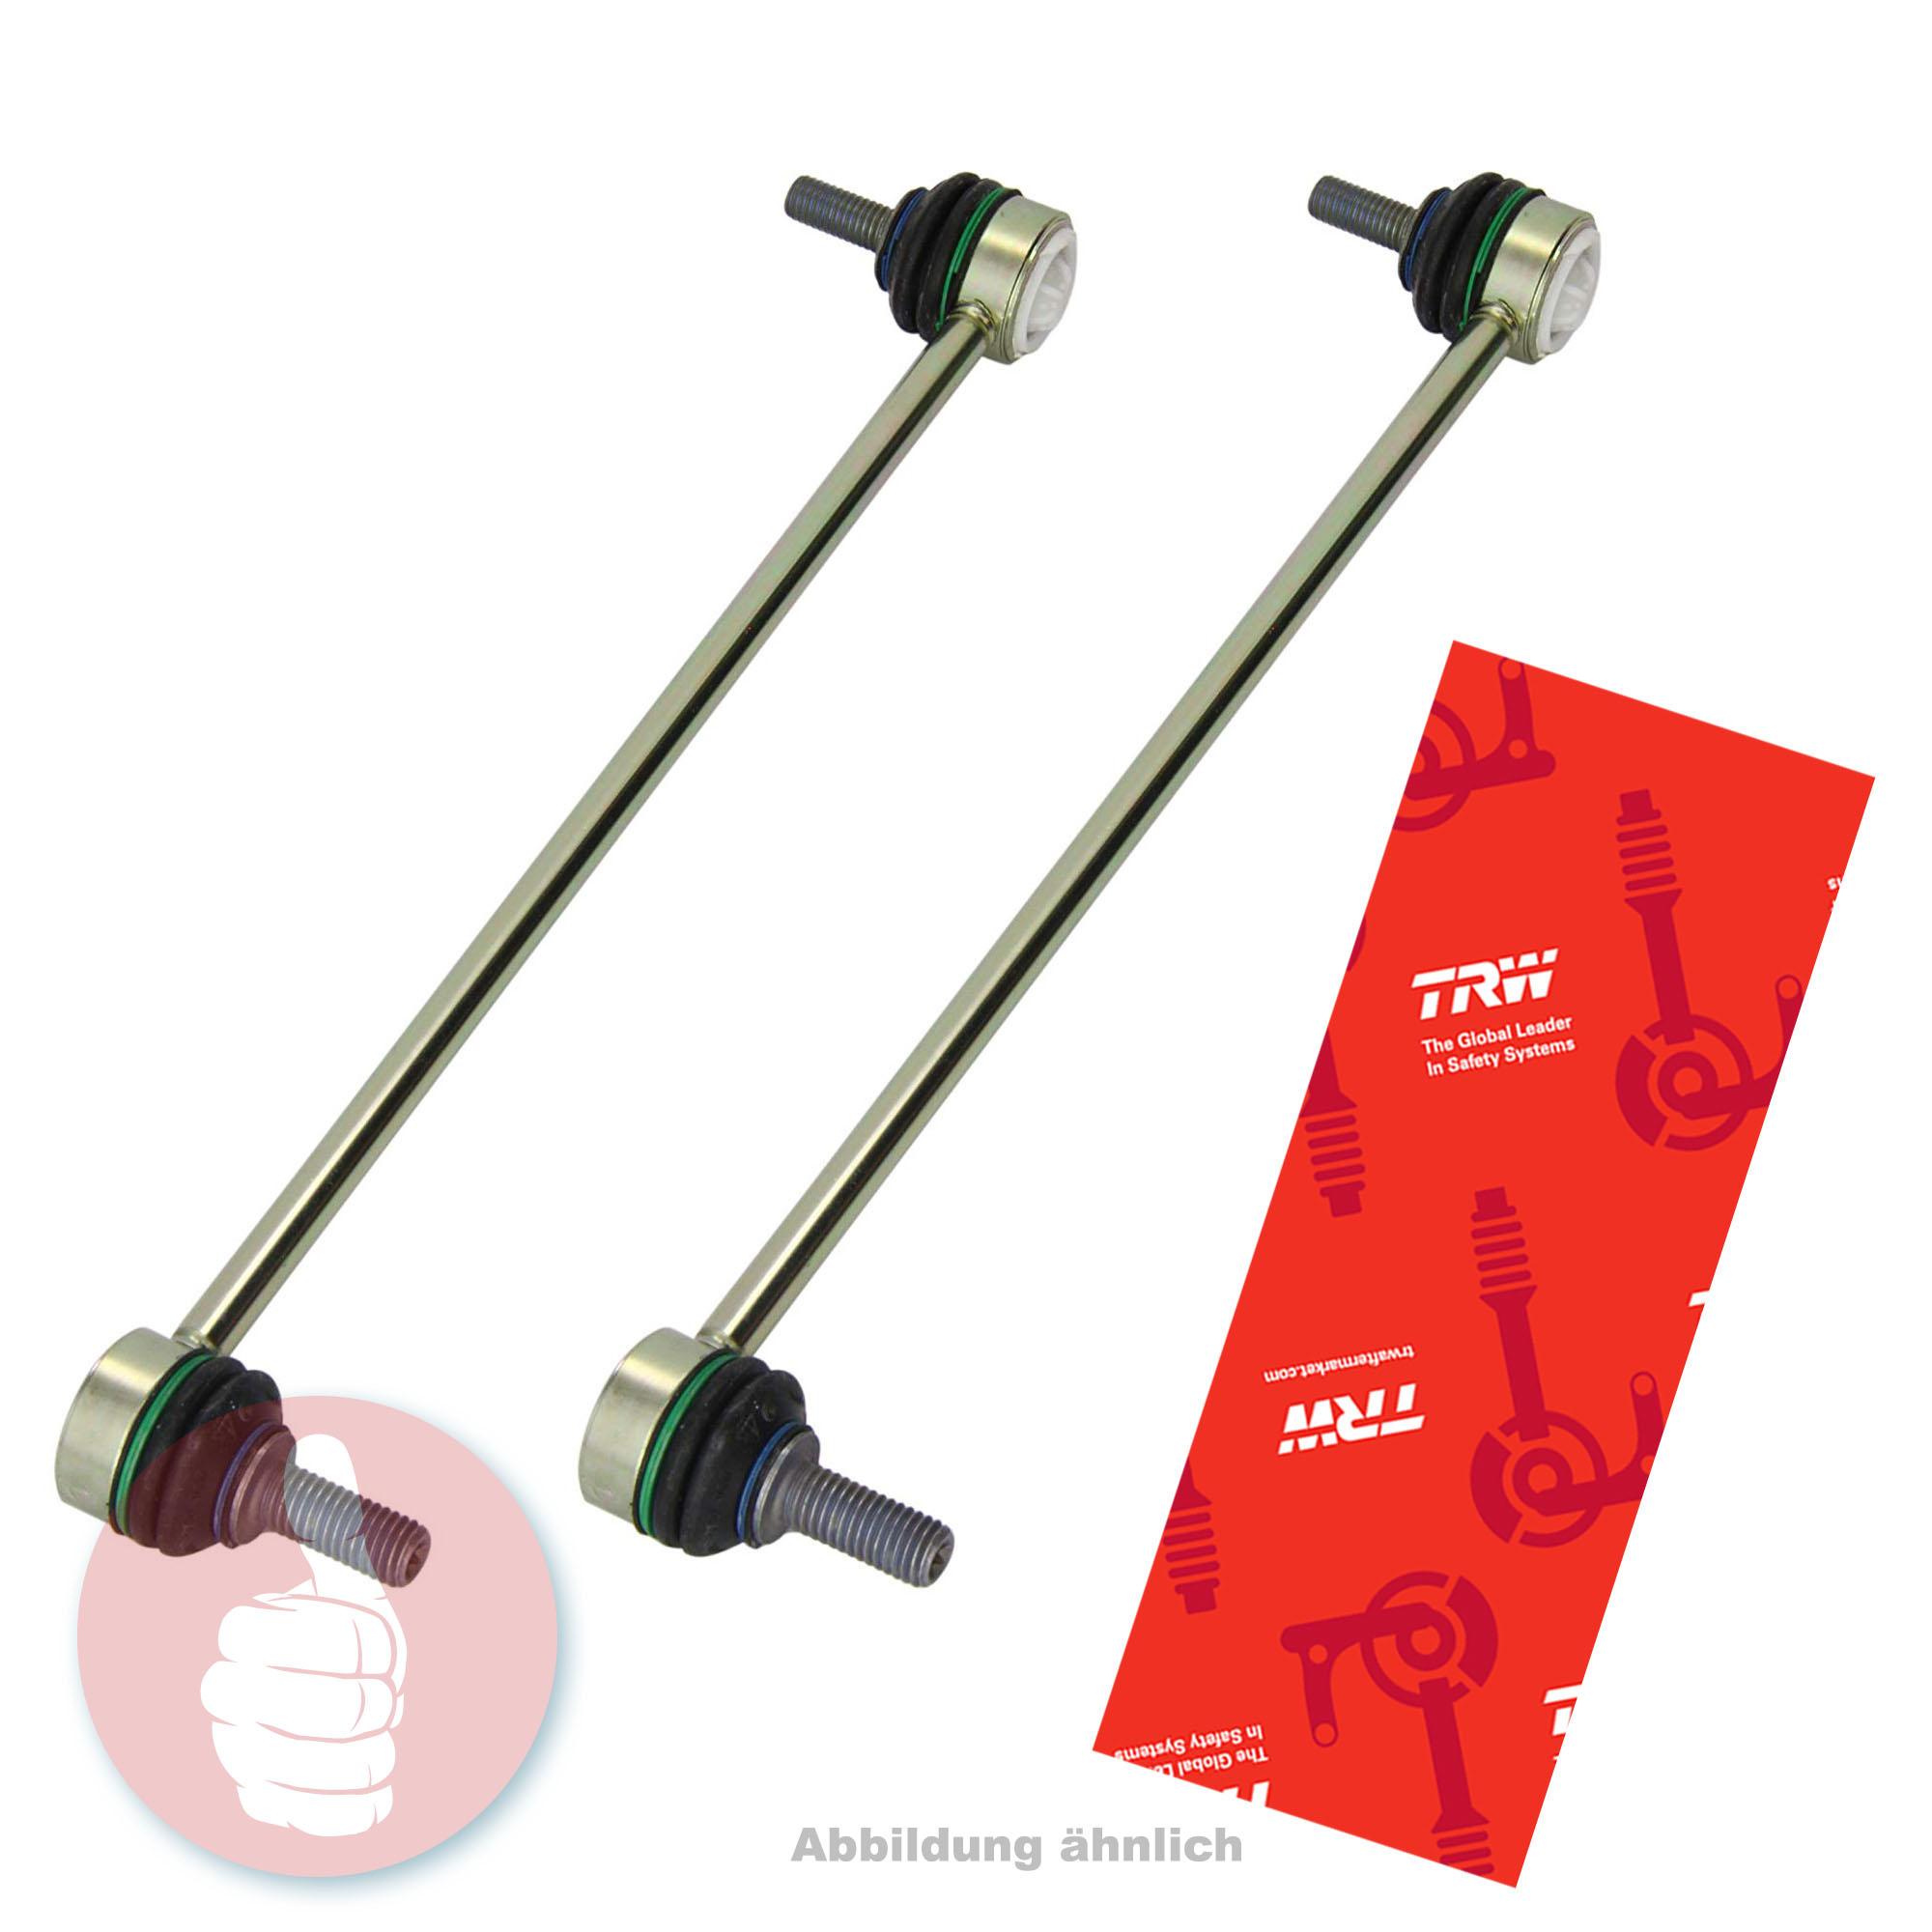 MonroeStange//Strebe Stabilisator Vorne Links Rechts für VW u.a L29616